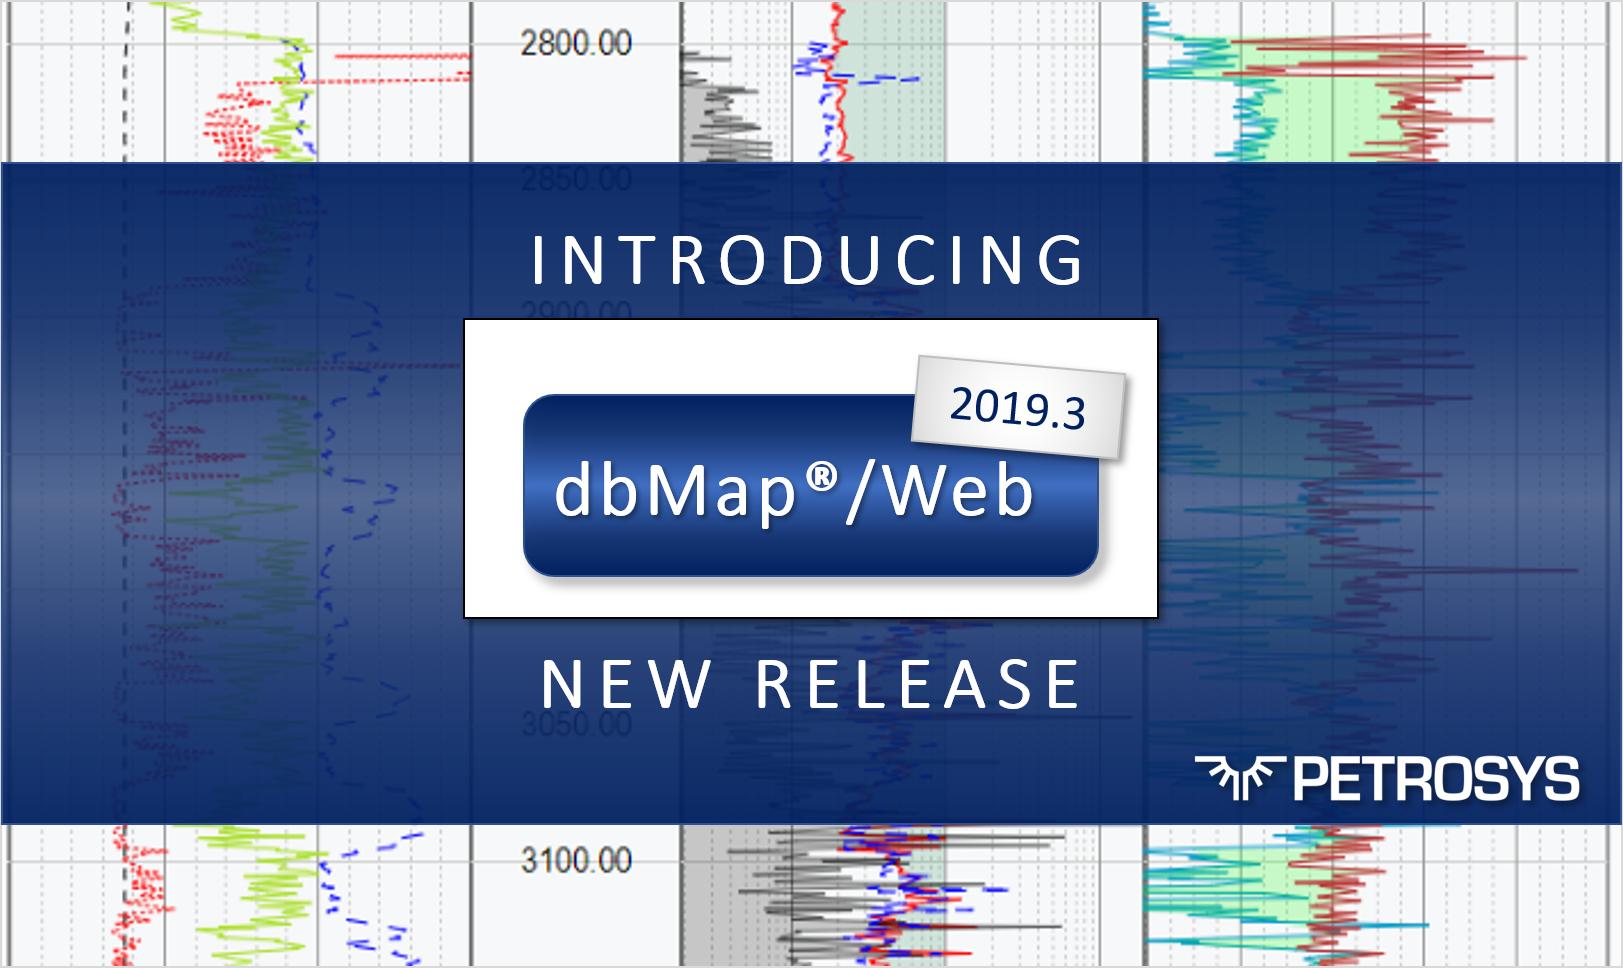 Introducing dbMap®/Web 2019.3